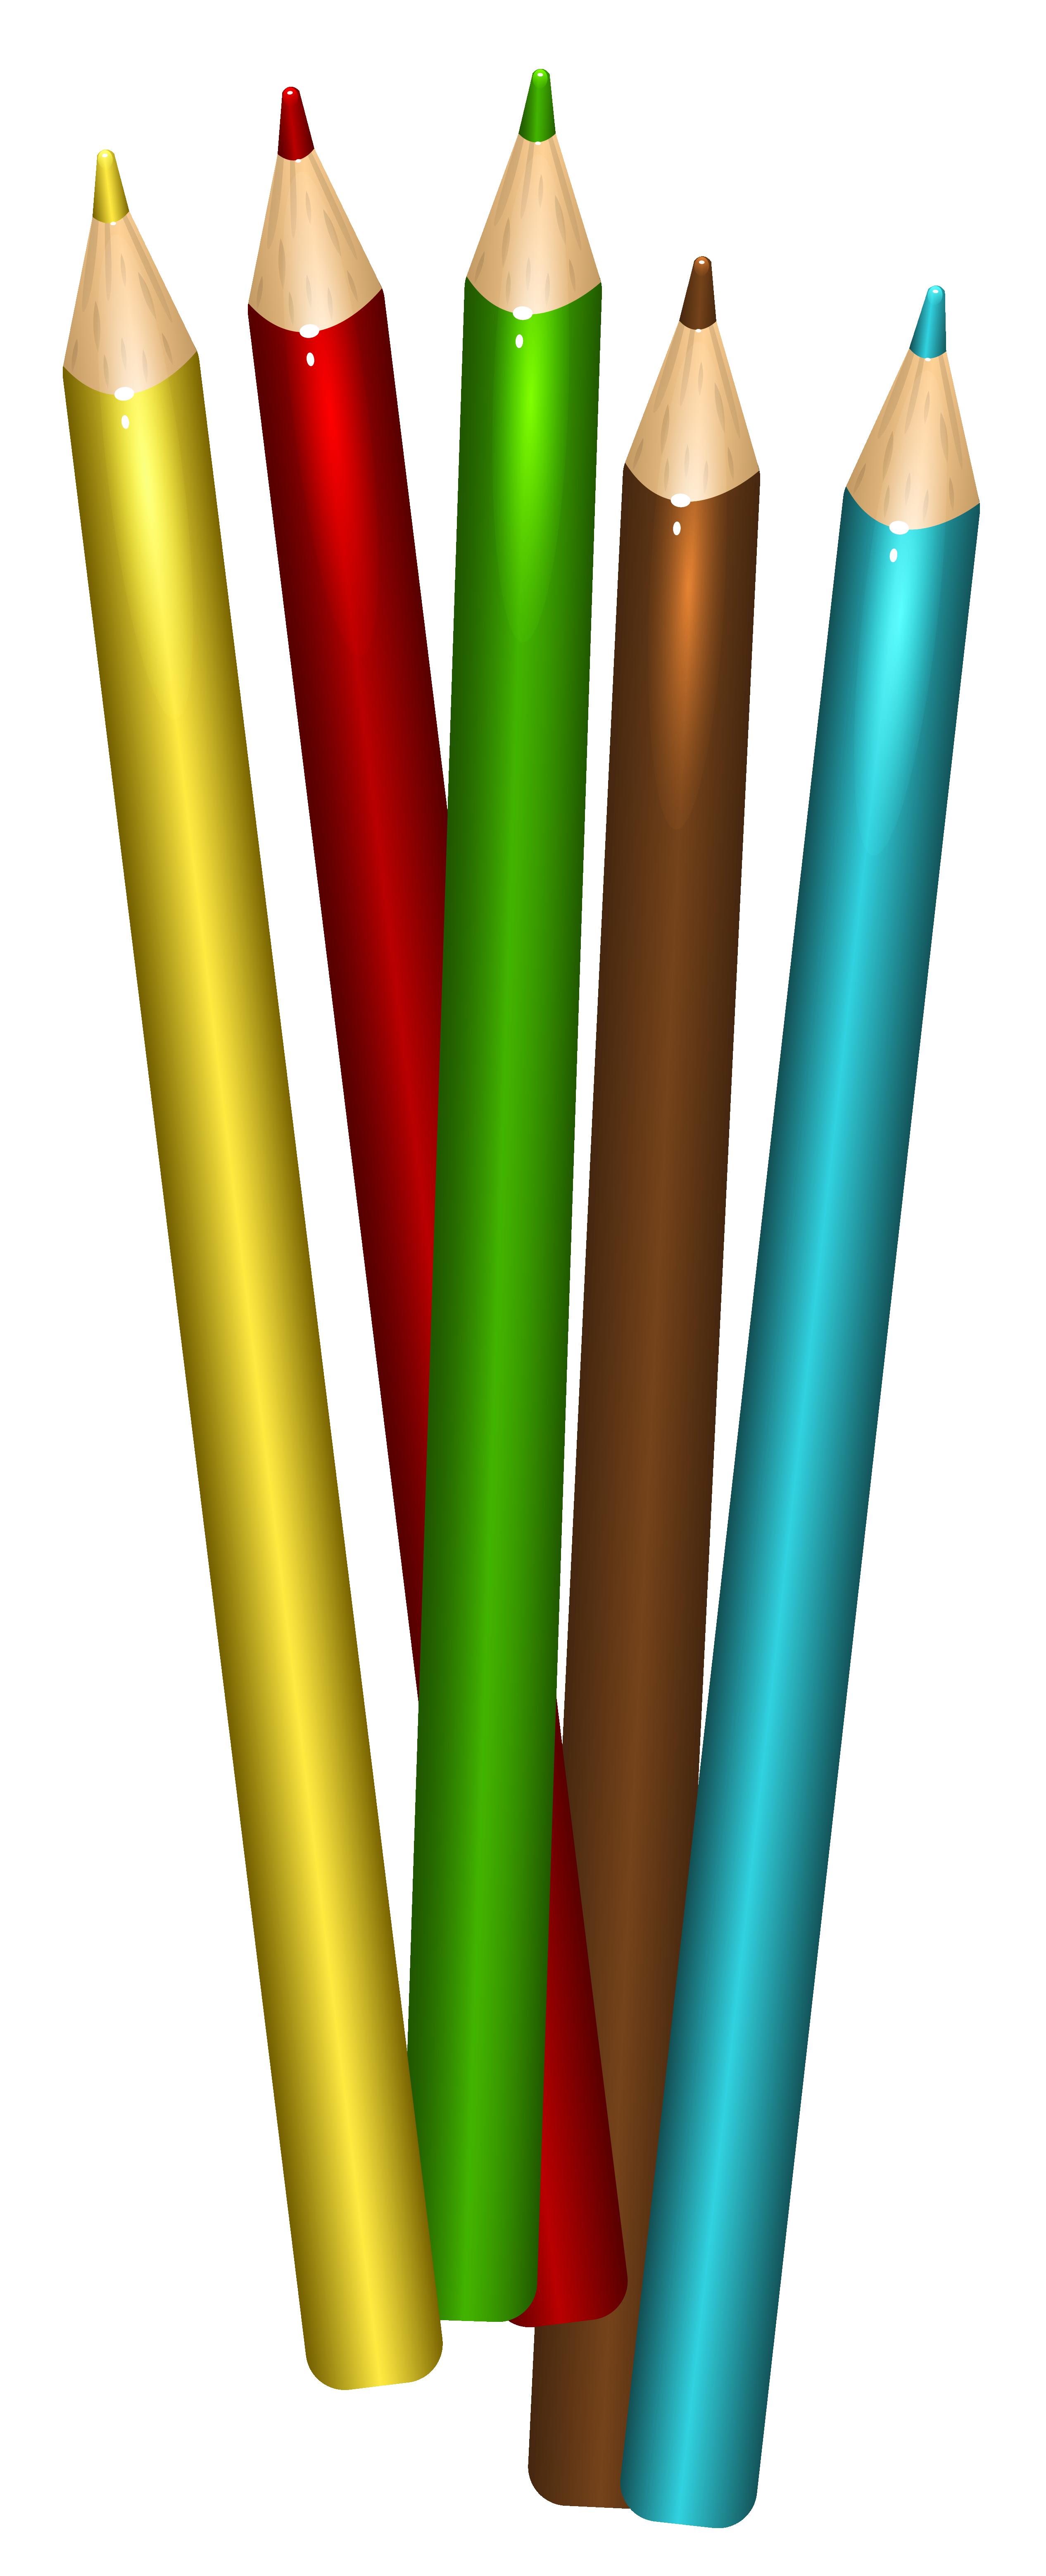 School pencils clipart download School Pencils PNG Clipart Image | Gallery Yopriceville - High ... download